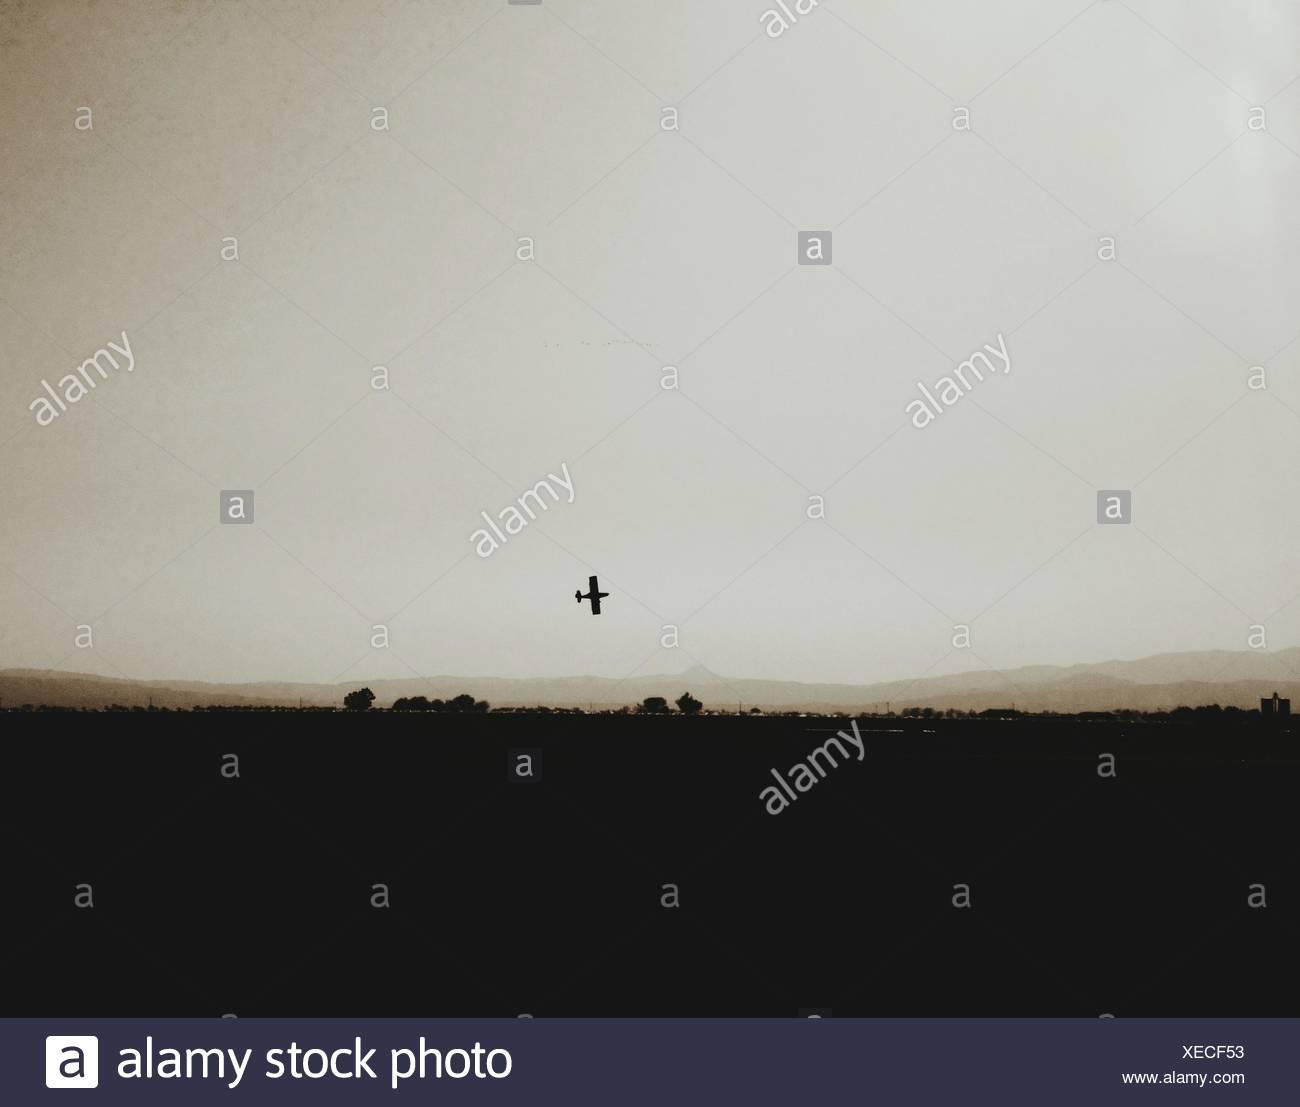 Silhouette Landscape Against Sky - Stock Image